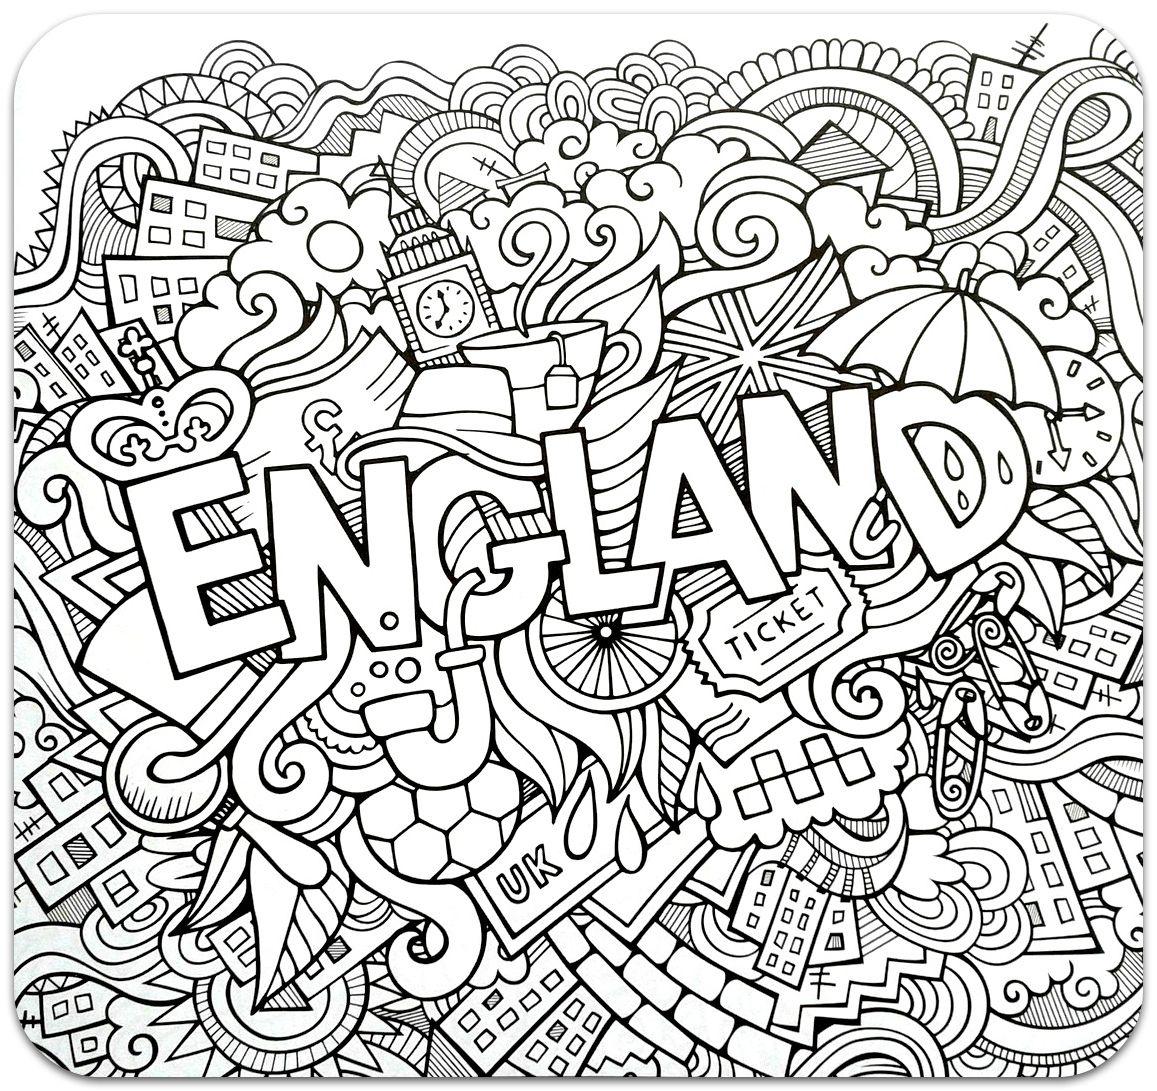 Розмальовки-антистрес. Країни (частина 1) (с изображениями ...